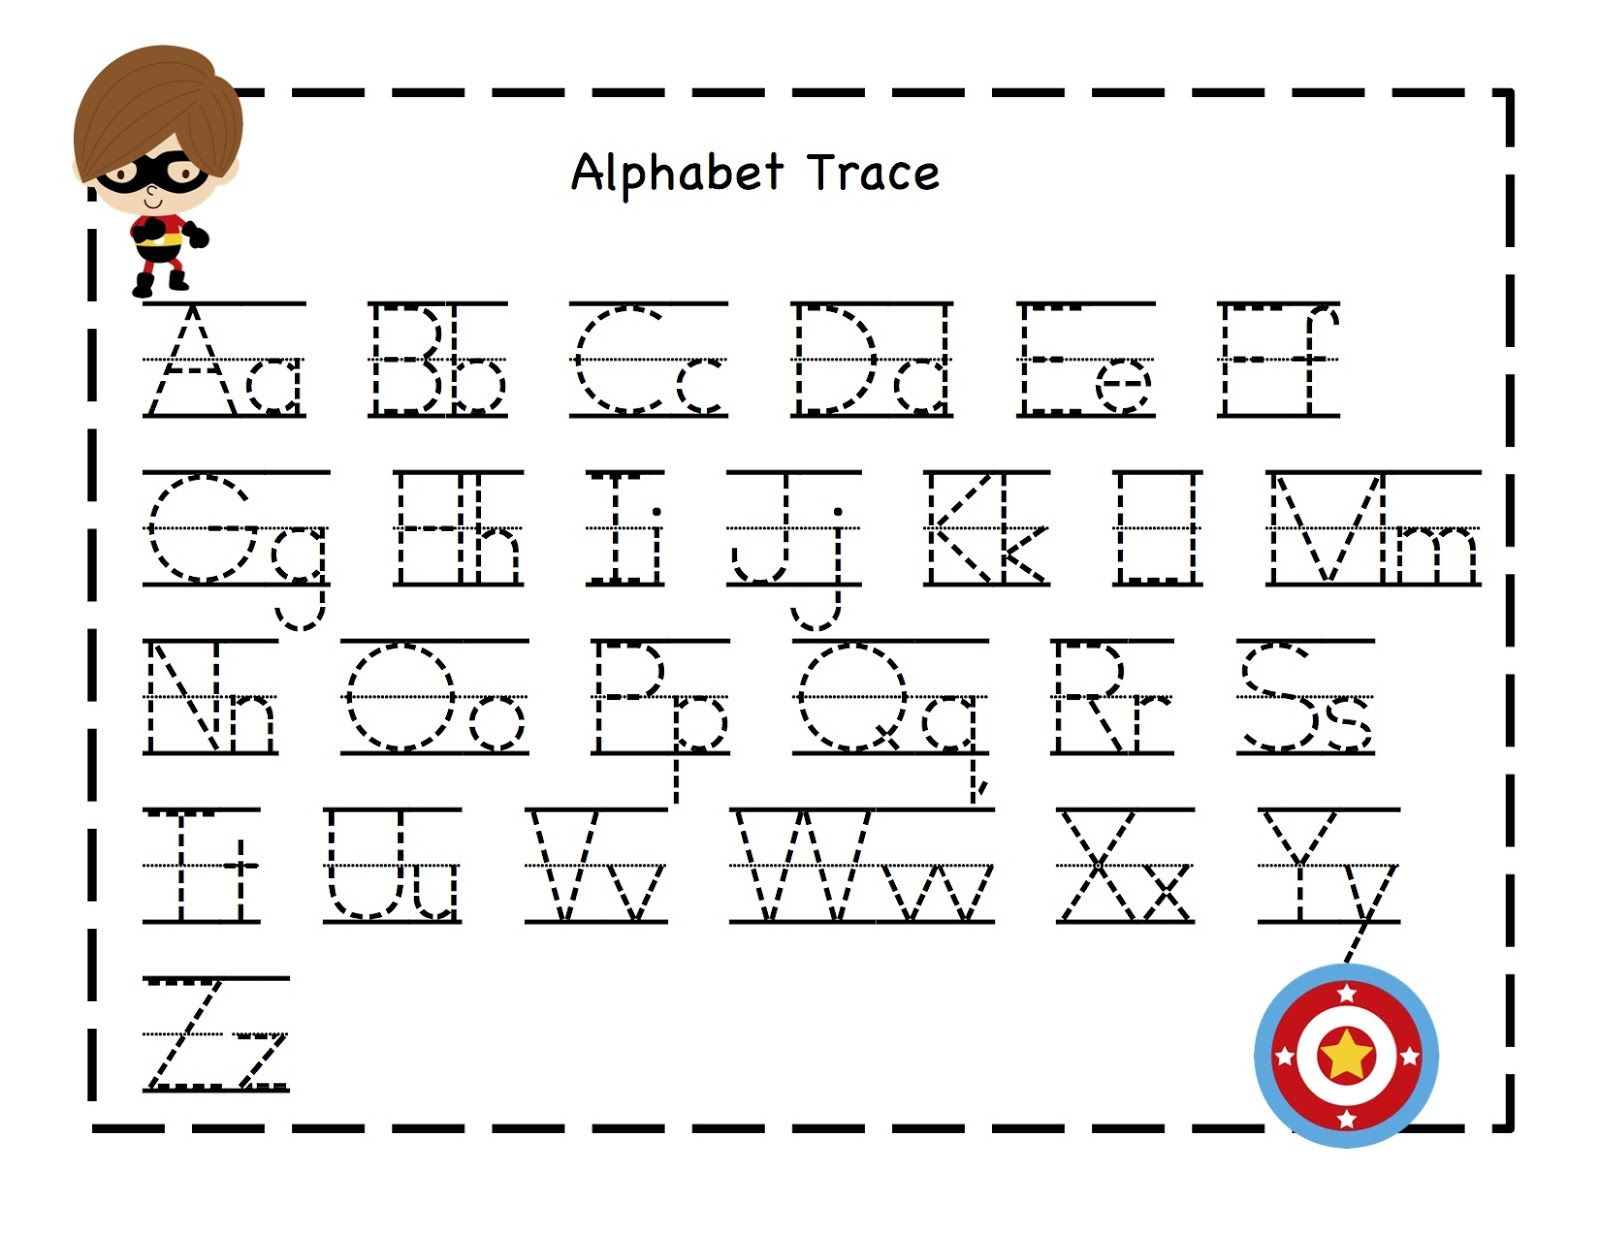 Super Hero Abc Tracing Sheets 1 | Alphabet Tracing inside Alphabet A Tracing Sheet